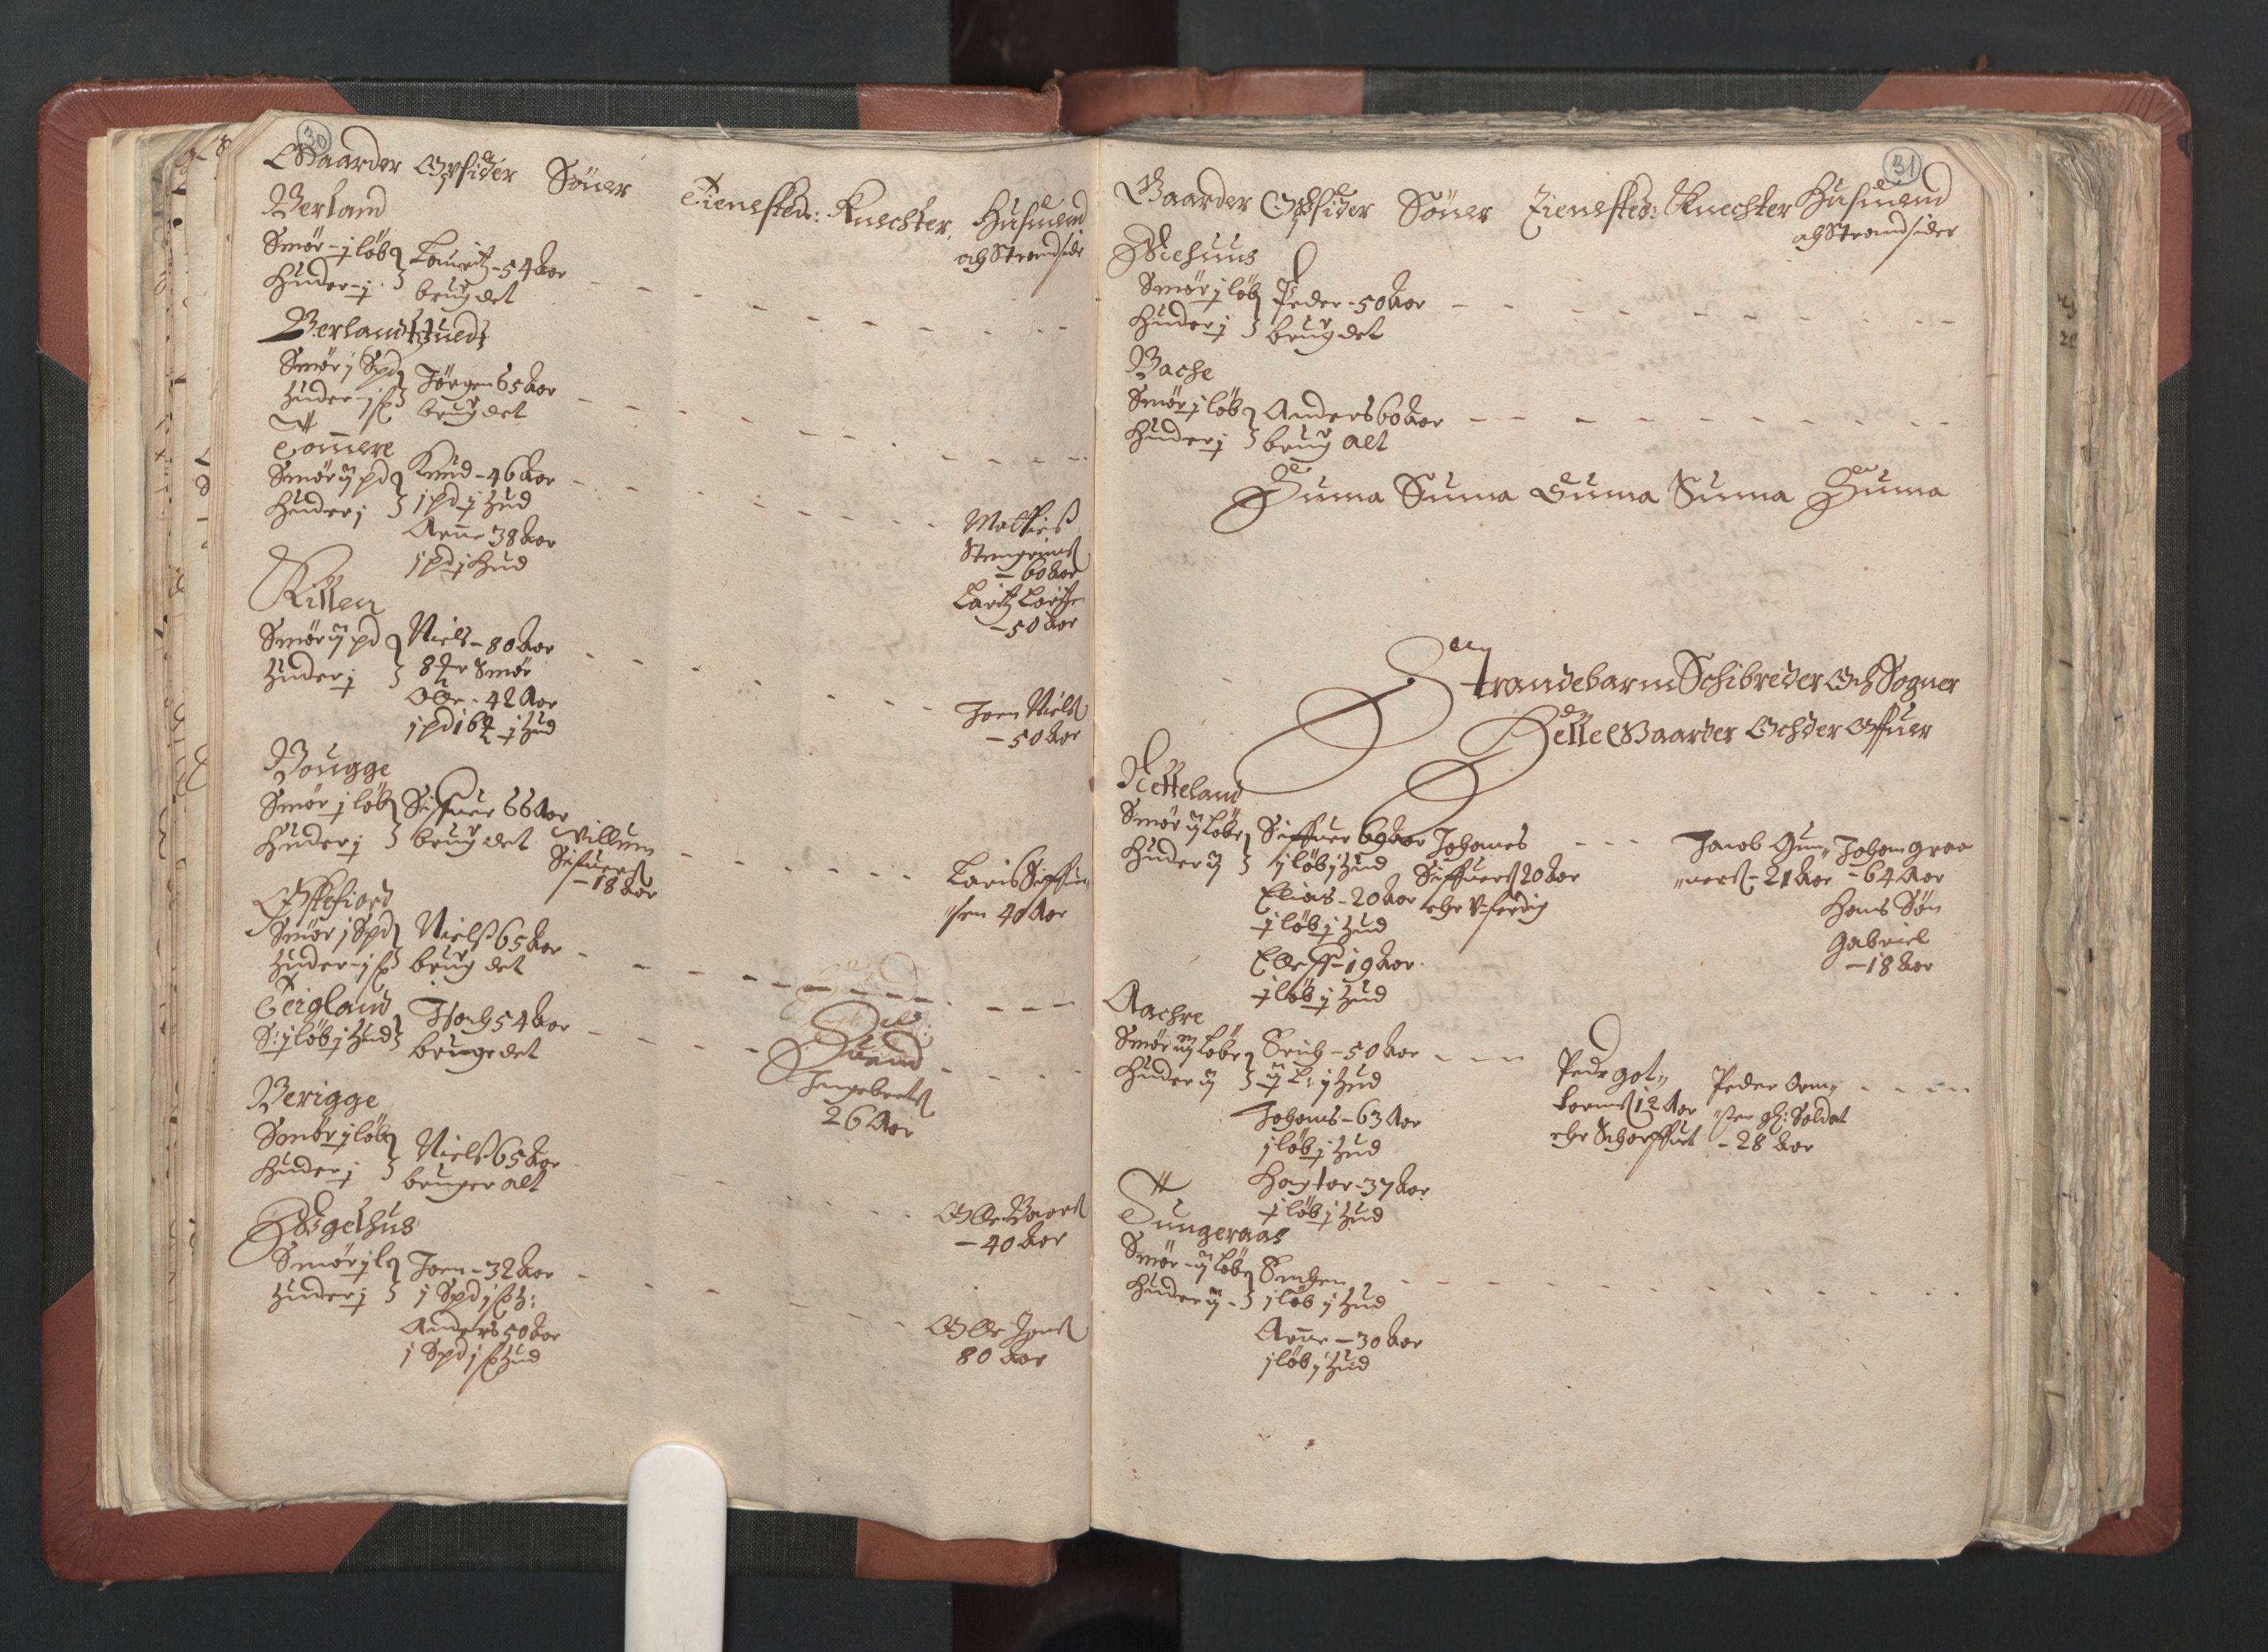 RA, Fogdenes og sorenskrivernes manntall 1664-1666, nr. 13: Nordhordland fogderi og Sunnhordland fogderi, 1665, s. 30-31